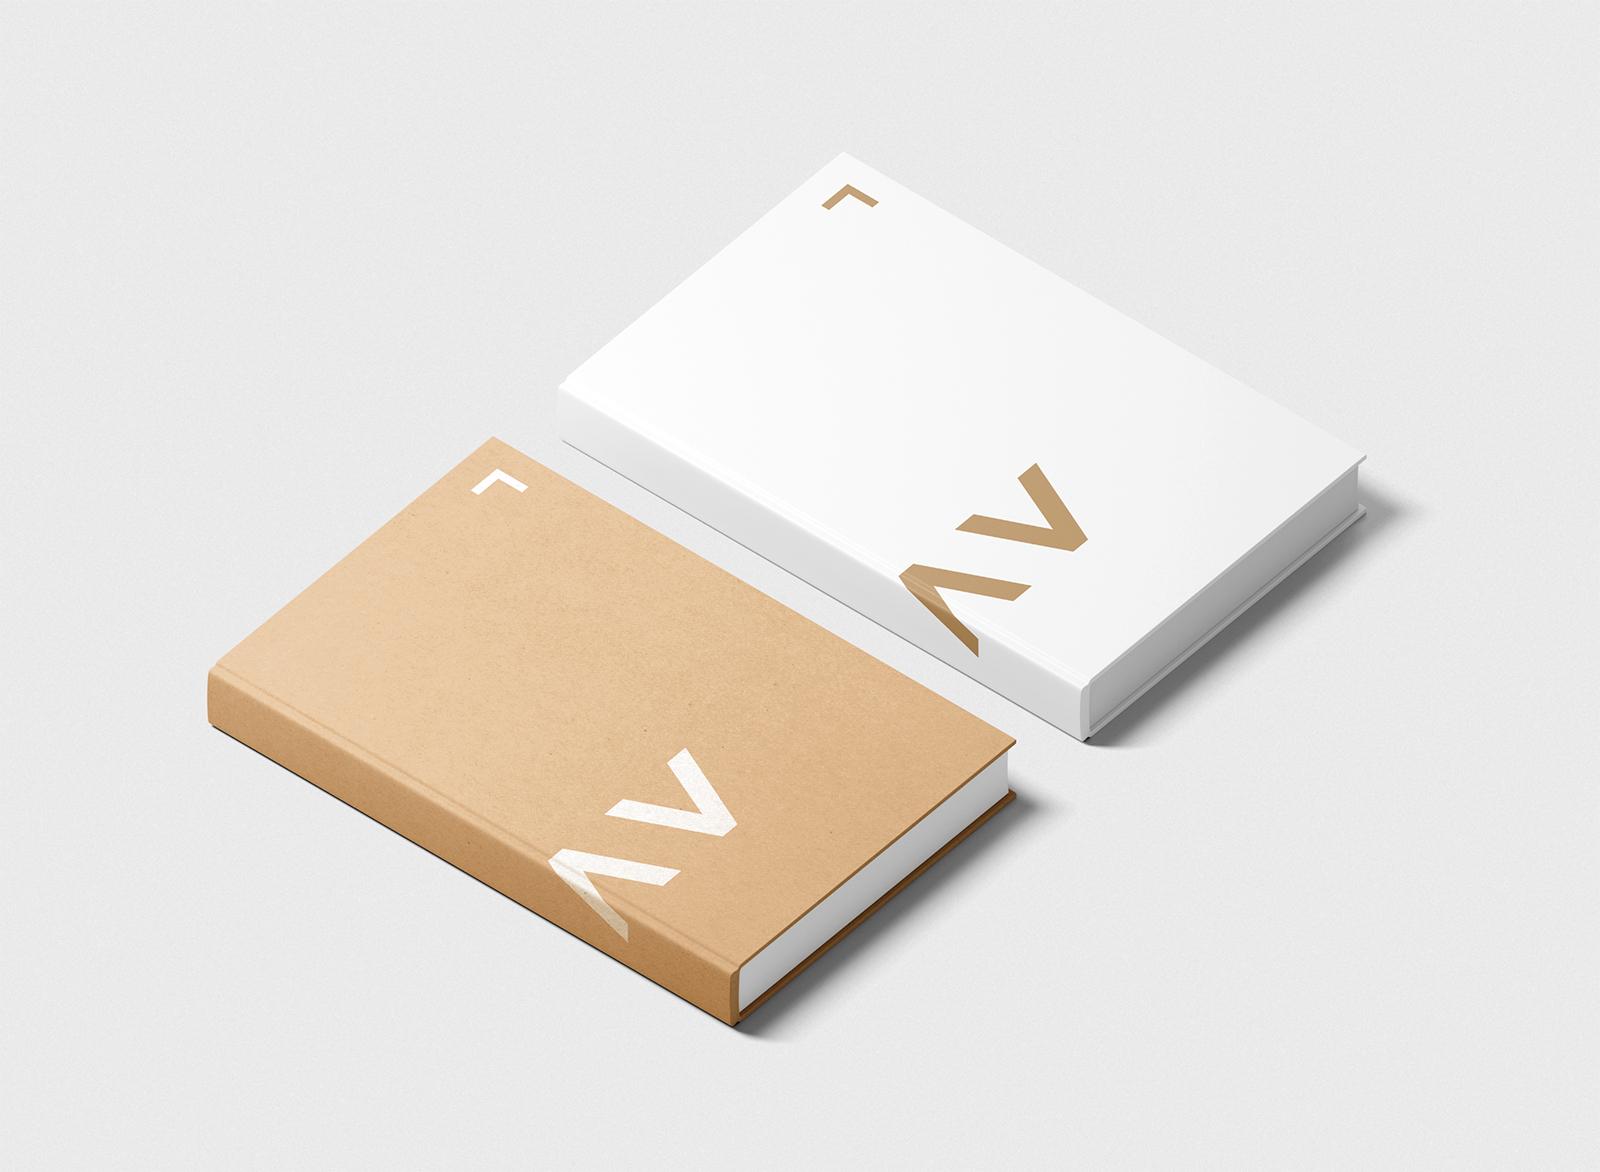 Two Book Covers Free Mockup Isometric Scene